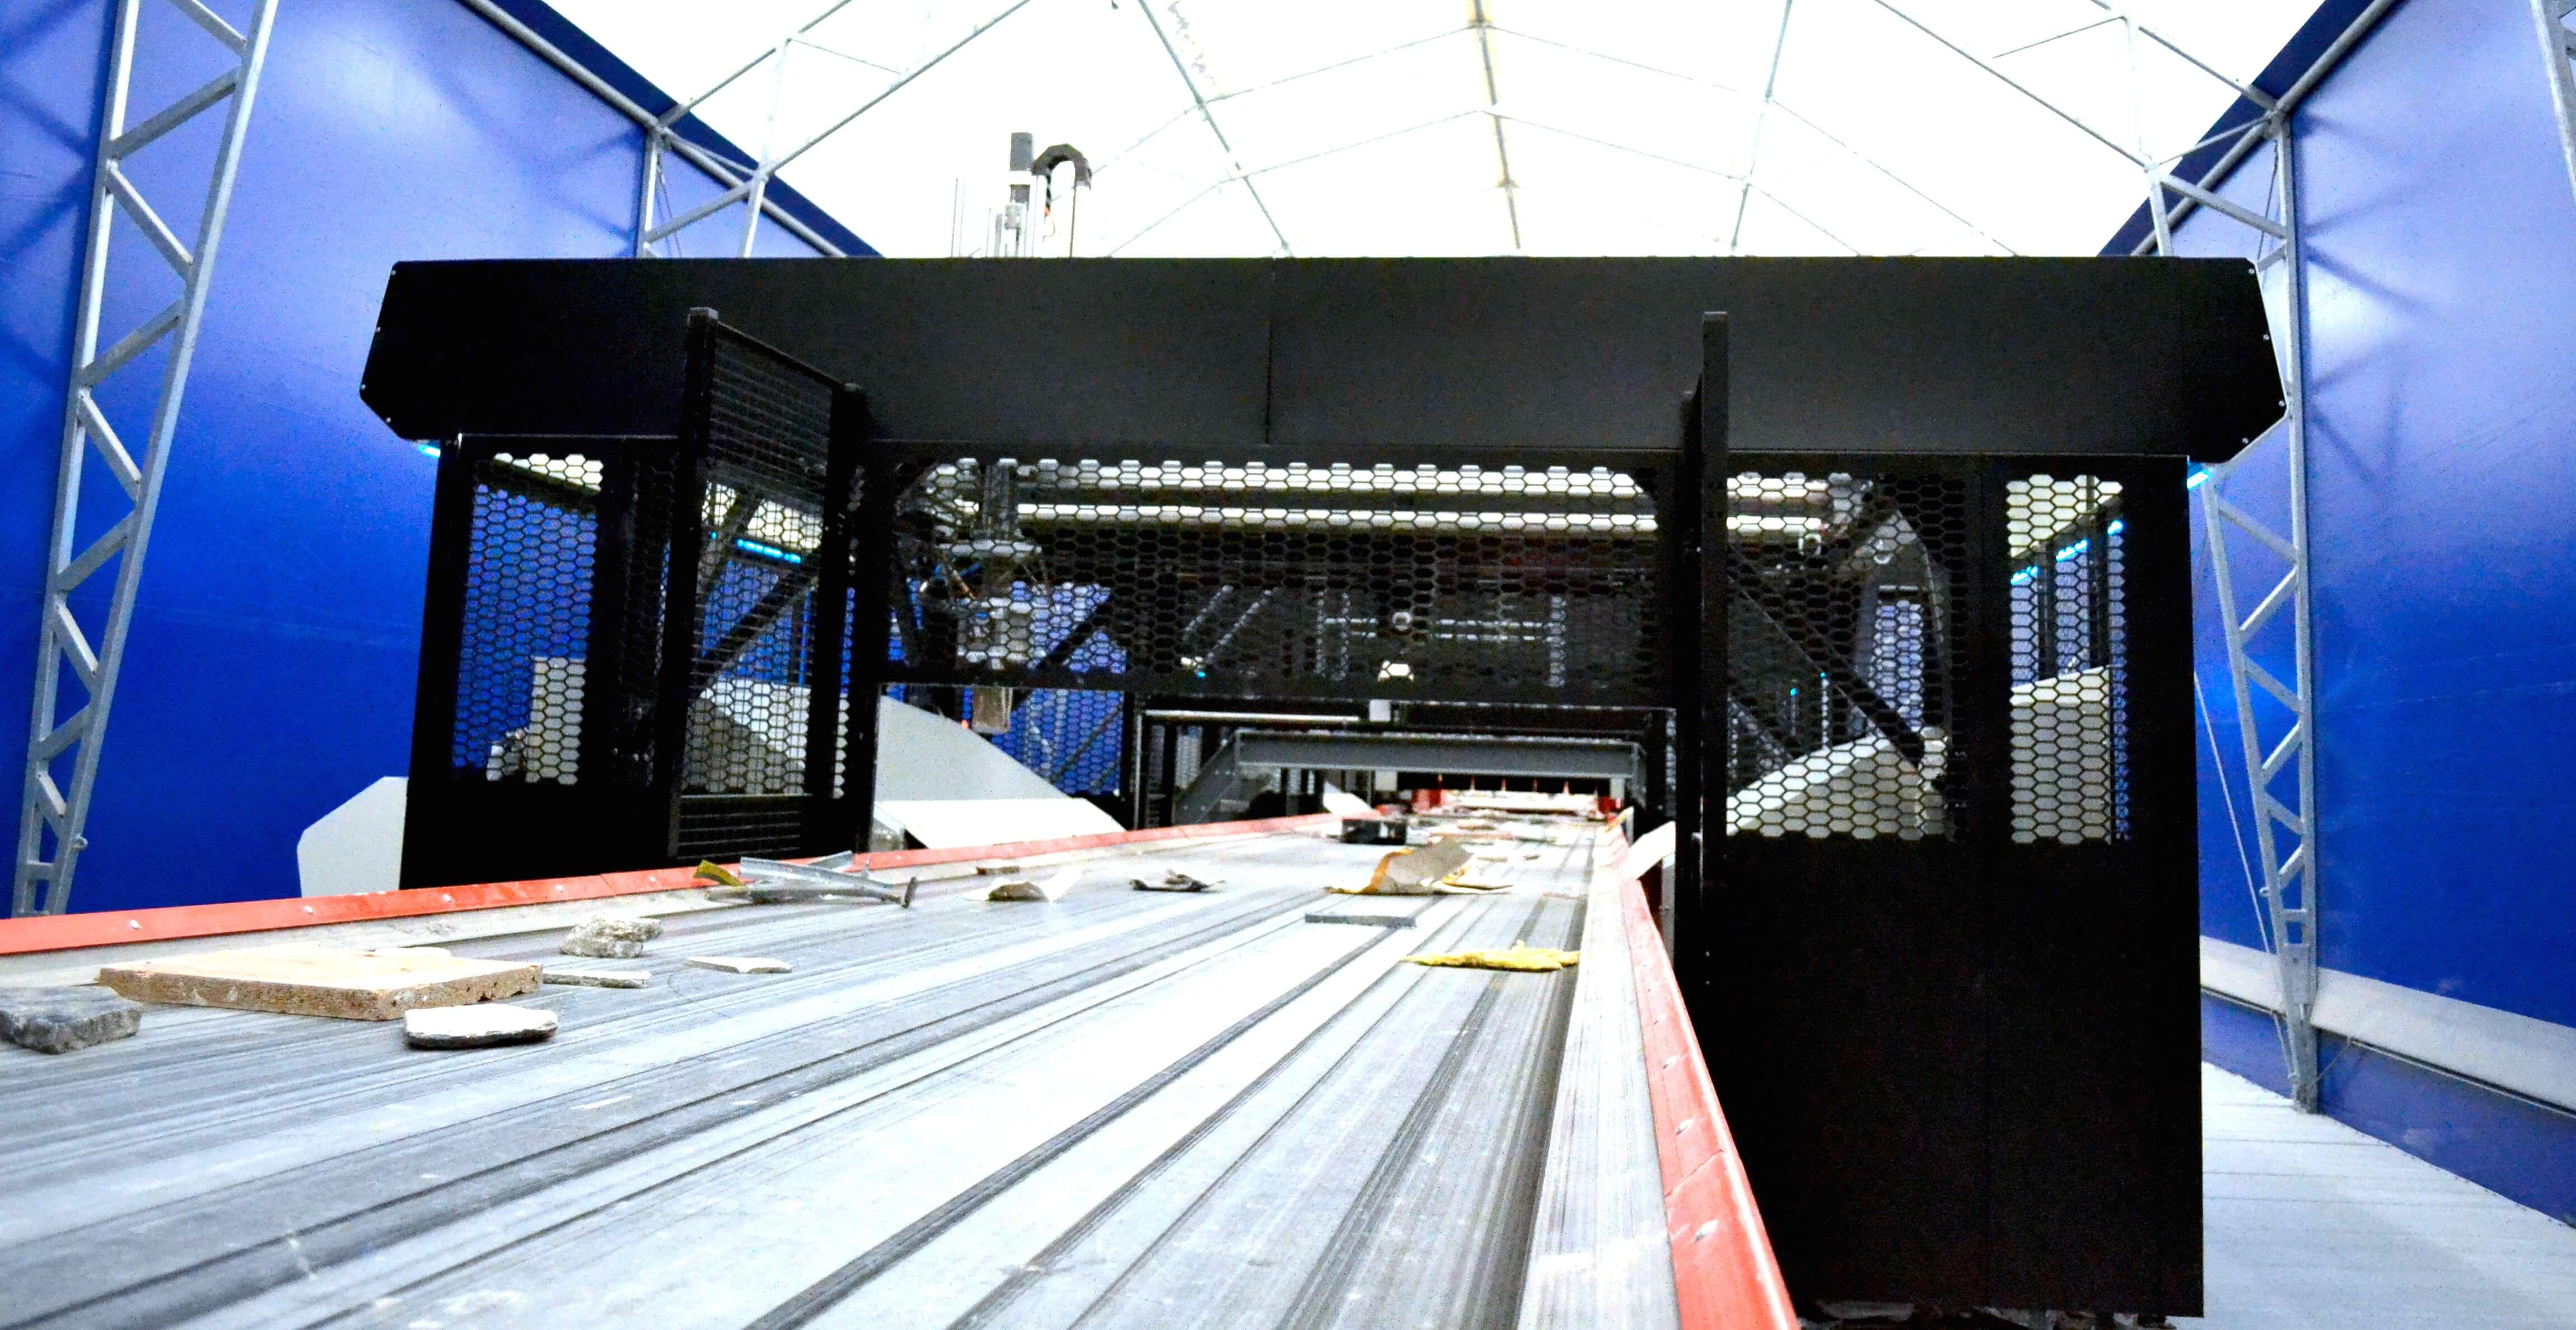 ZenRobotics-Line-Malmoe Wind Turbine Powers Robotic Waste-Sorting System